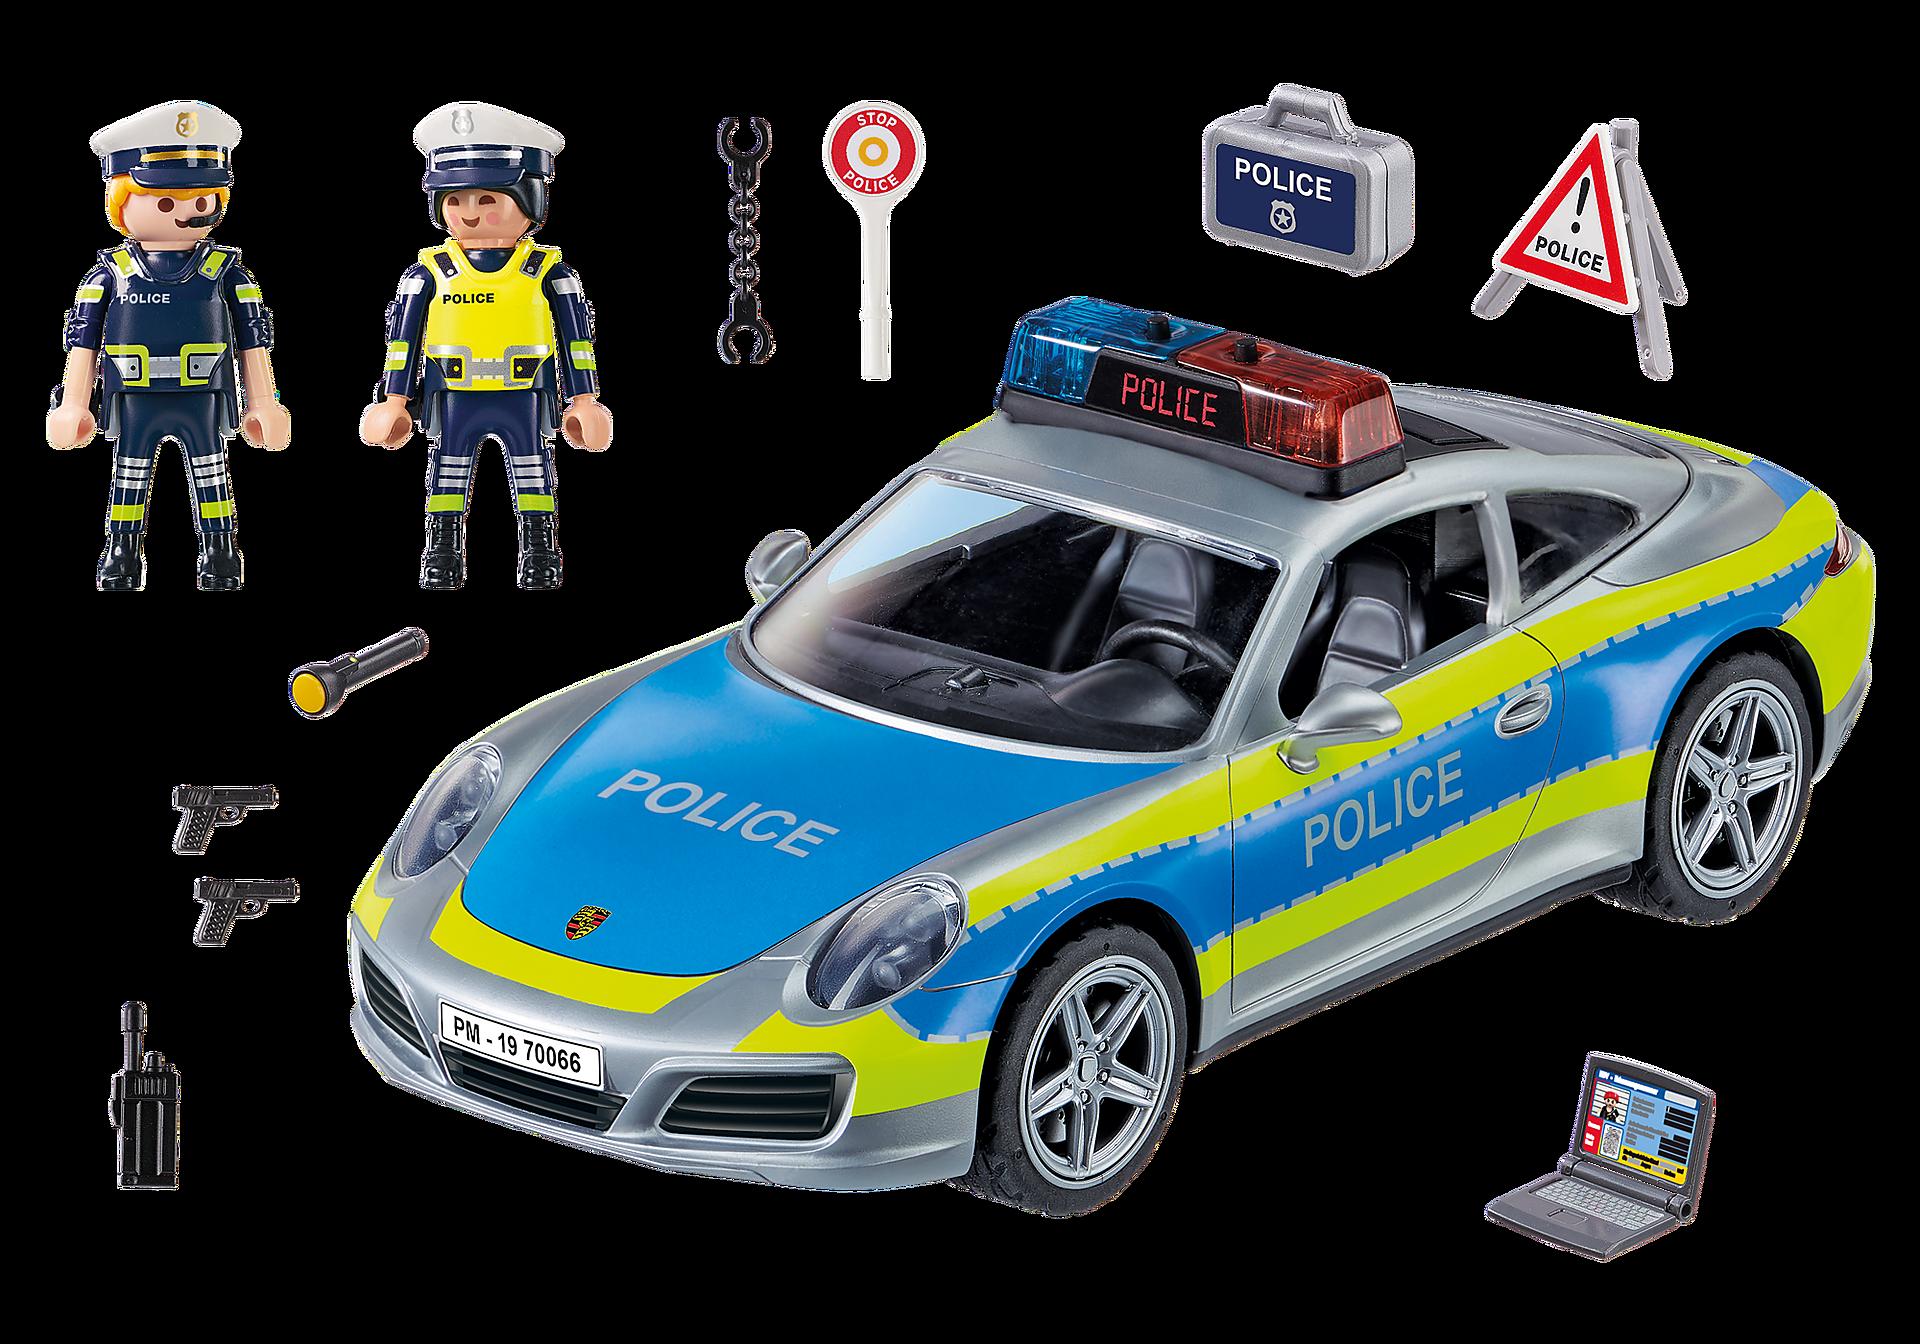 70066 Porsche 911 Carrera 4S Αστυνομικό όχημα zoom image3